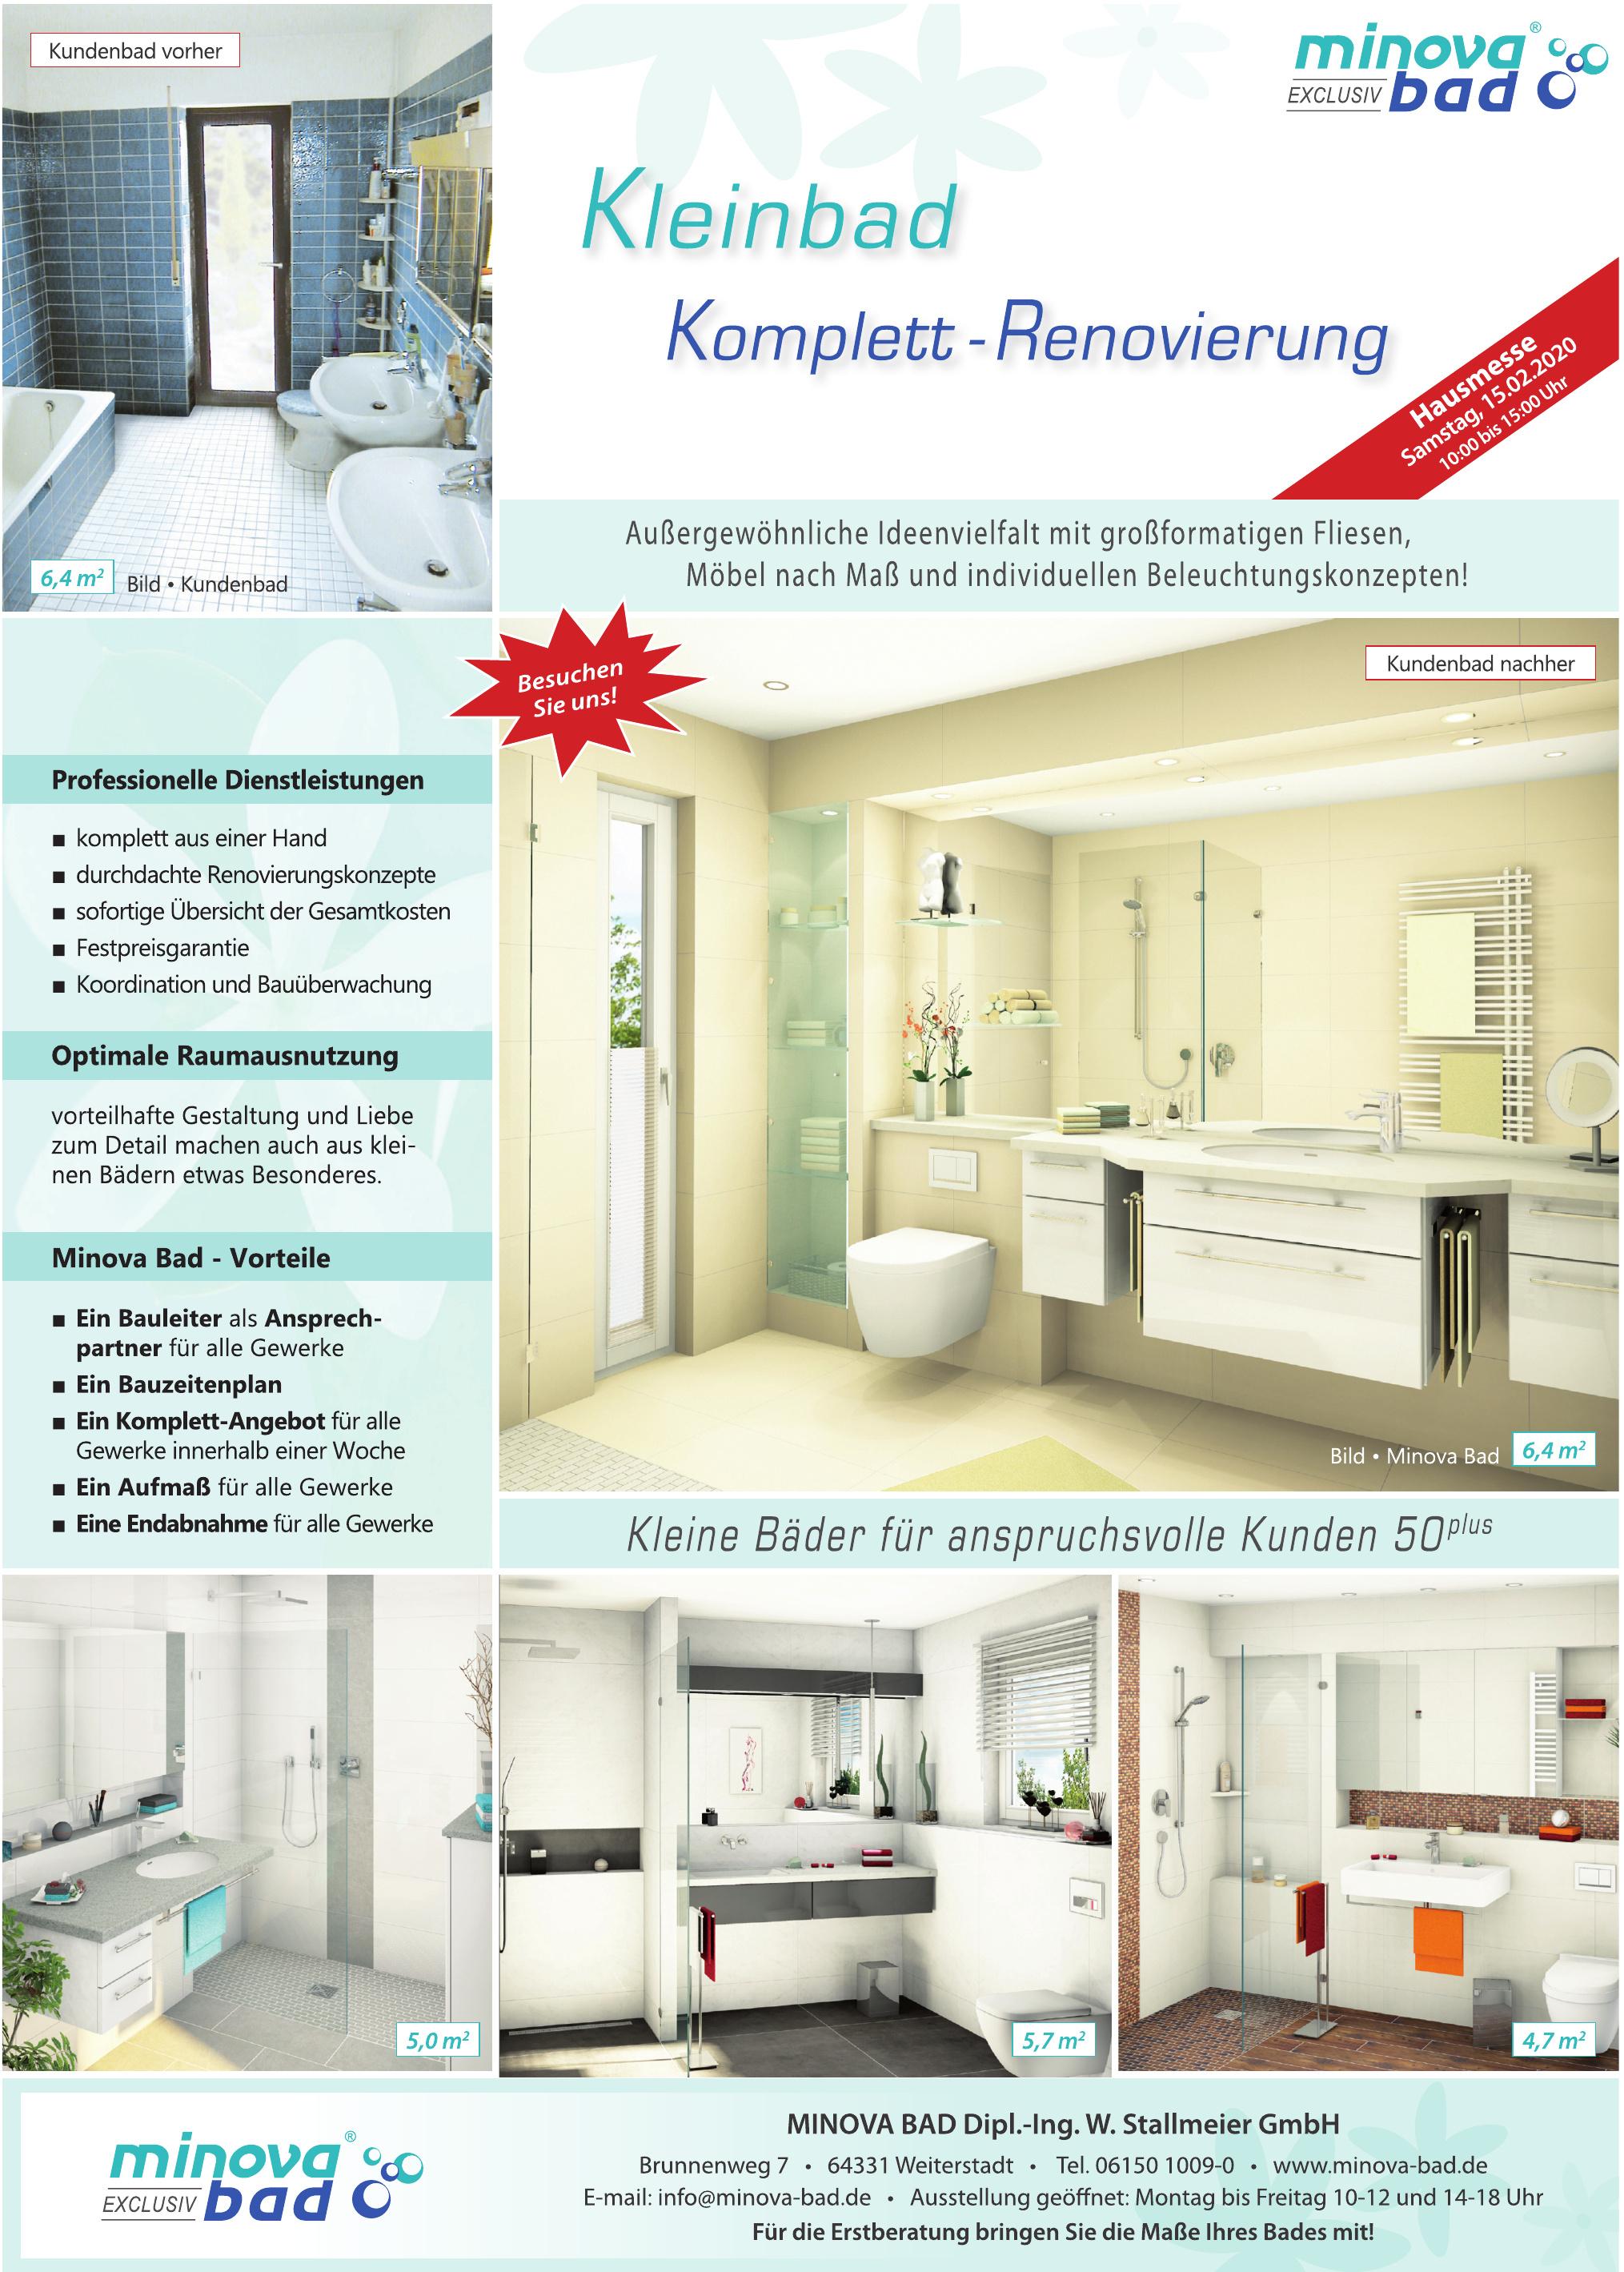 Minova Bad - Dipl.-Ing. W. Stallmeier GmbH